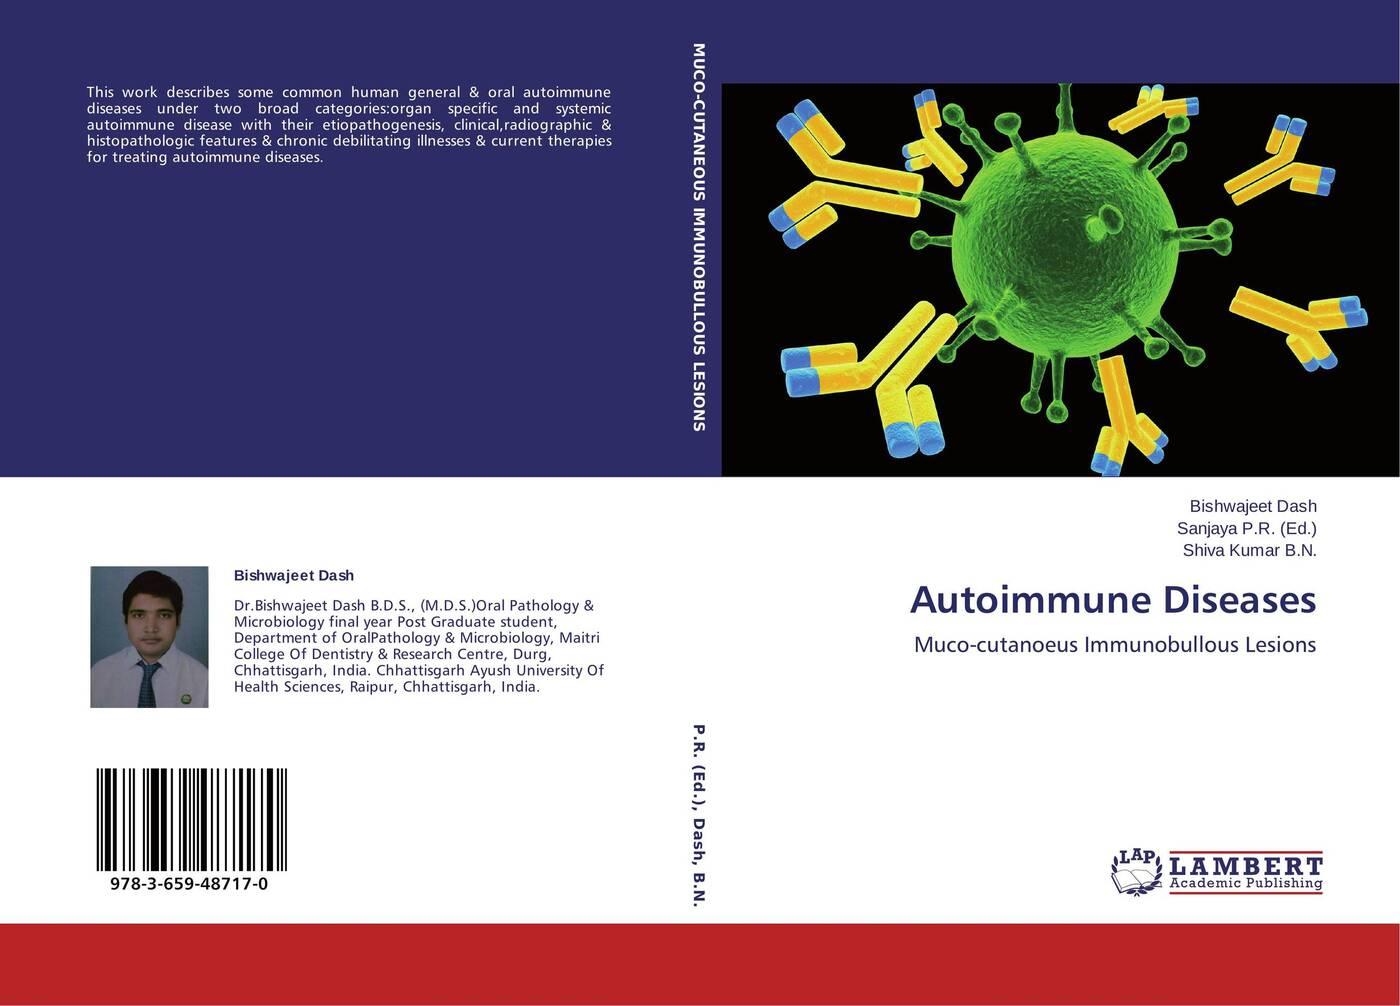 Bishwajeet Dash,Sanjaya P.R. and Shiva Kumar B.N. Autoimmune Diseases vaibhav kumar and latha s oral lichen planus a diagnostic marker of chronic liver disease